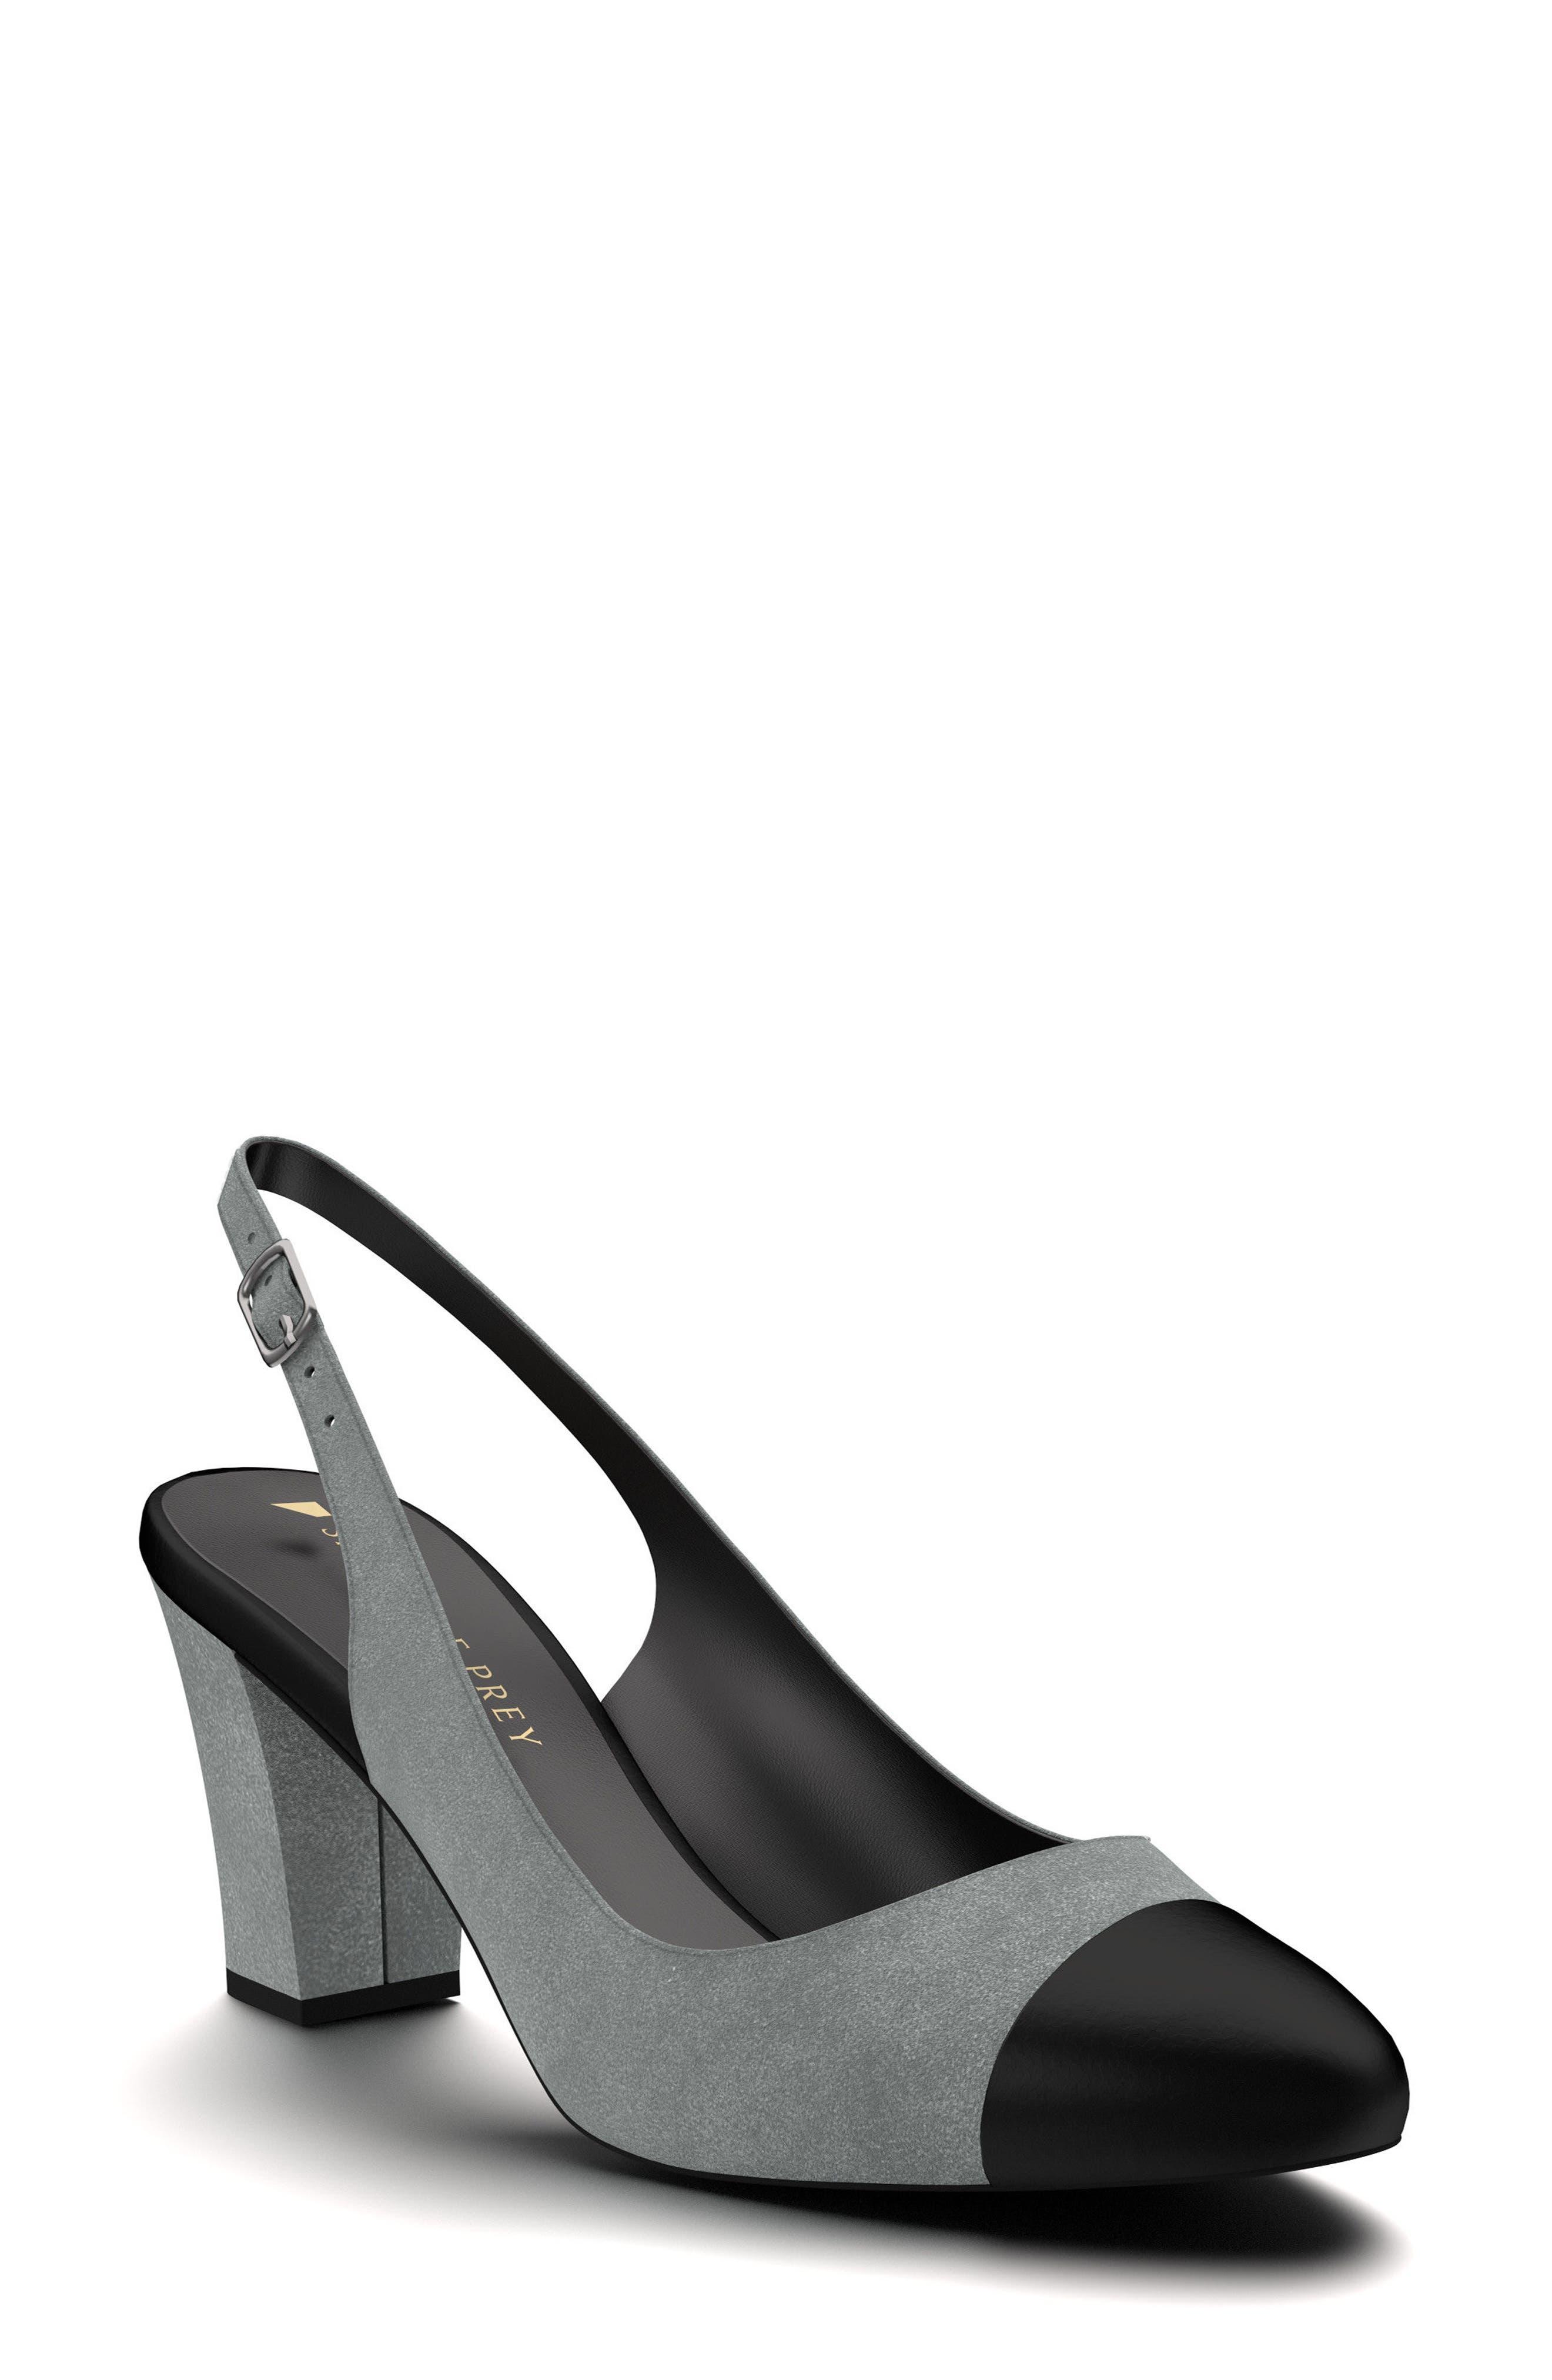 Shoes of Prey Slingback Pump (Women)